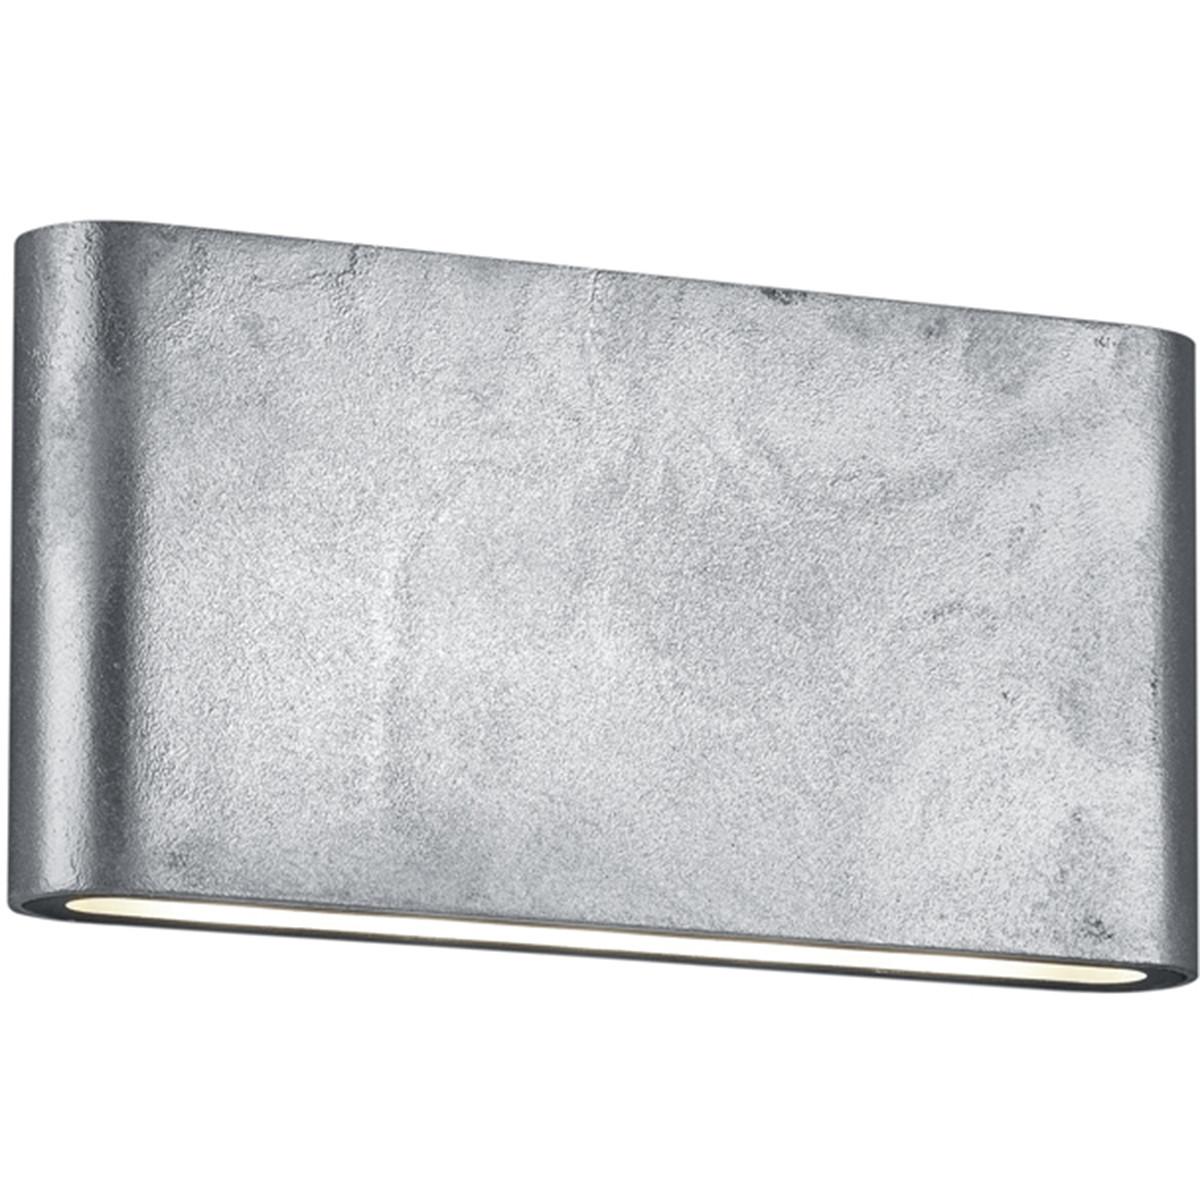 LED Tuinverlichting - Tuinlamp - Trion Thino - Wand - 8W - Mat Grijs - Aluminium